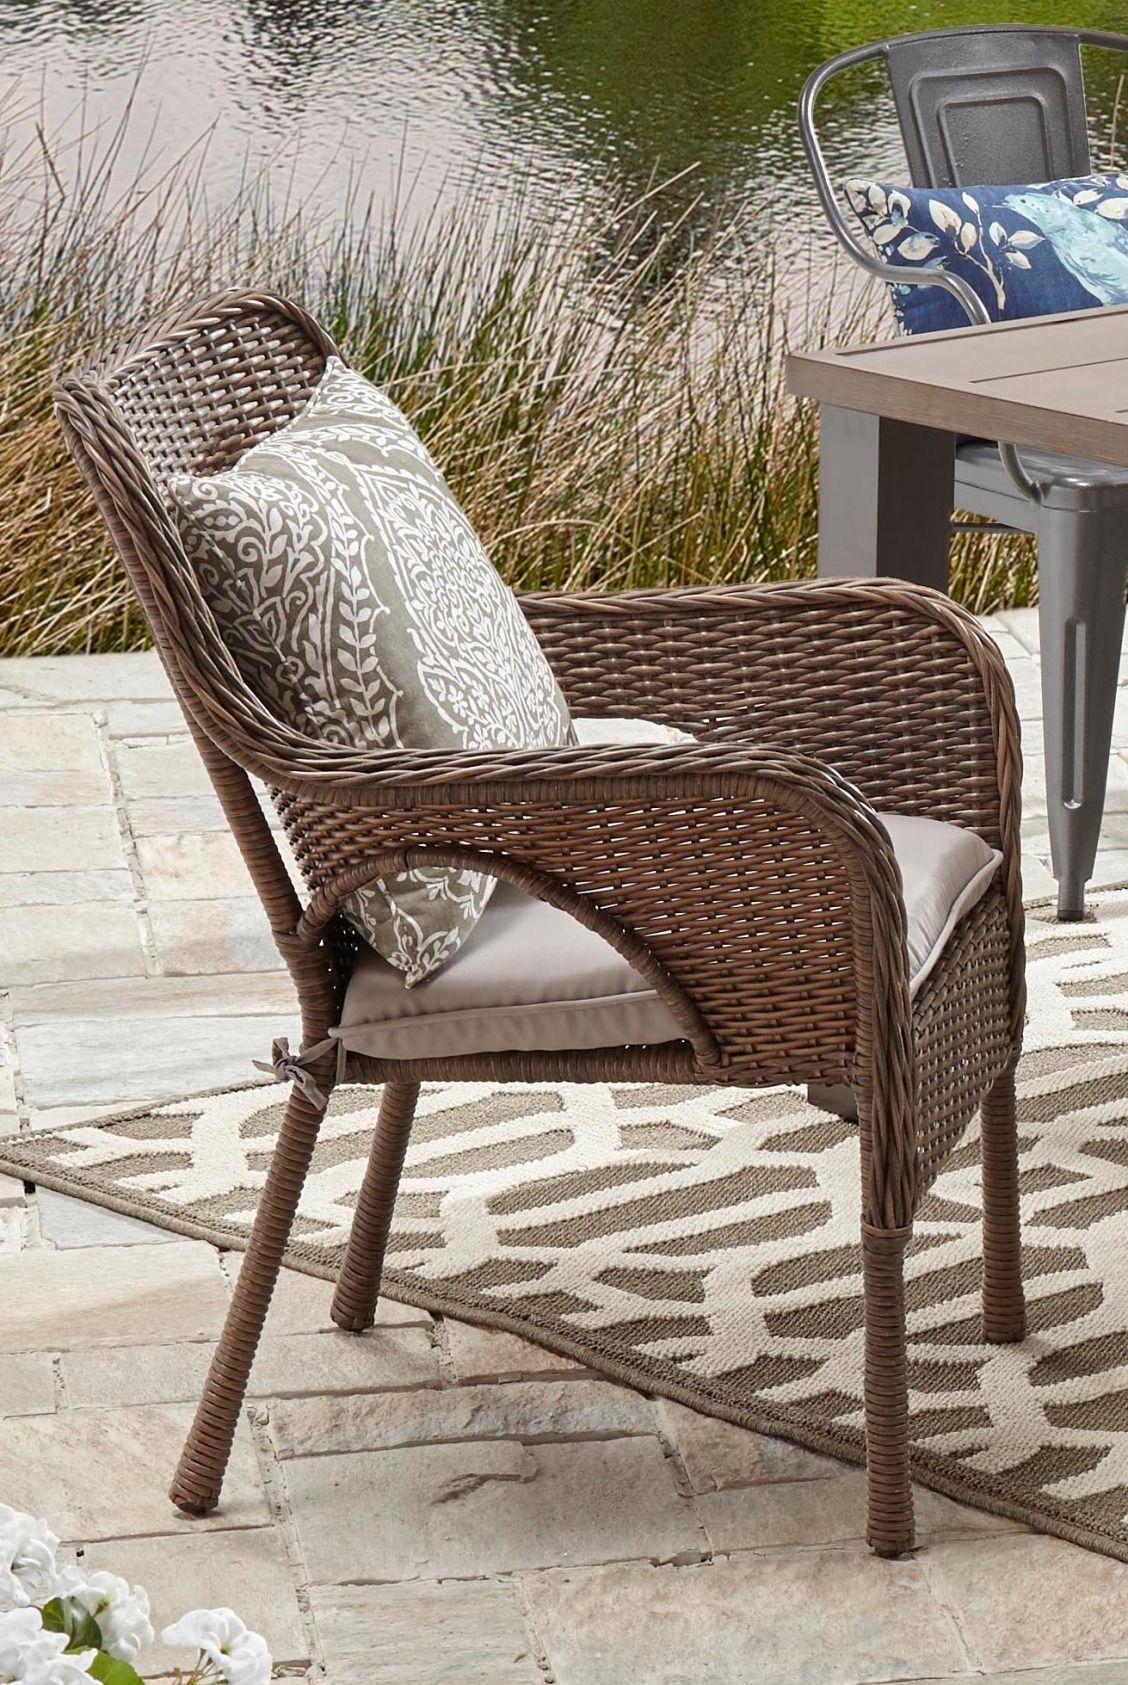 Camrose farmhouse wicker chair outdoor wicker chairs